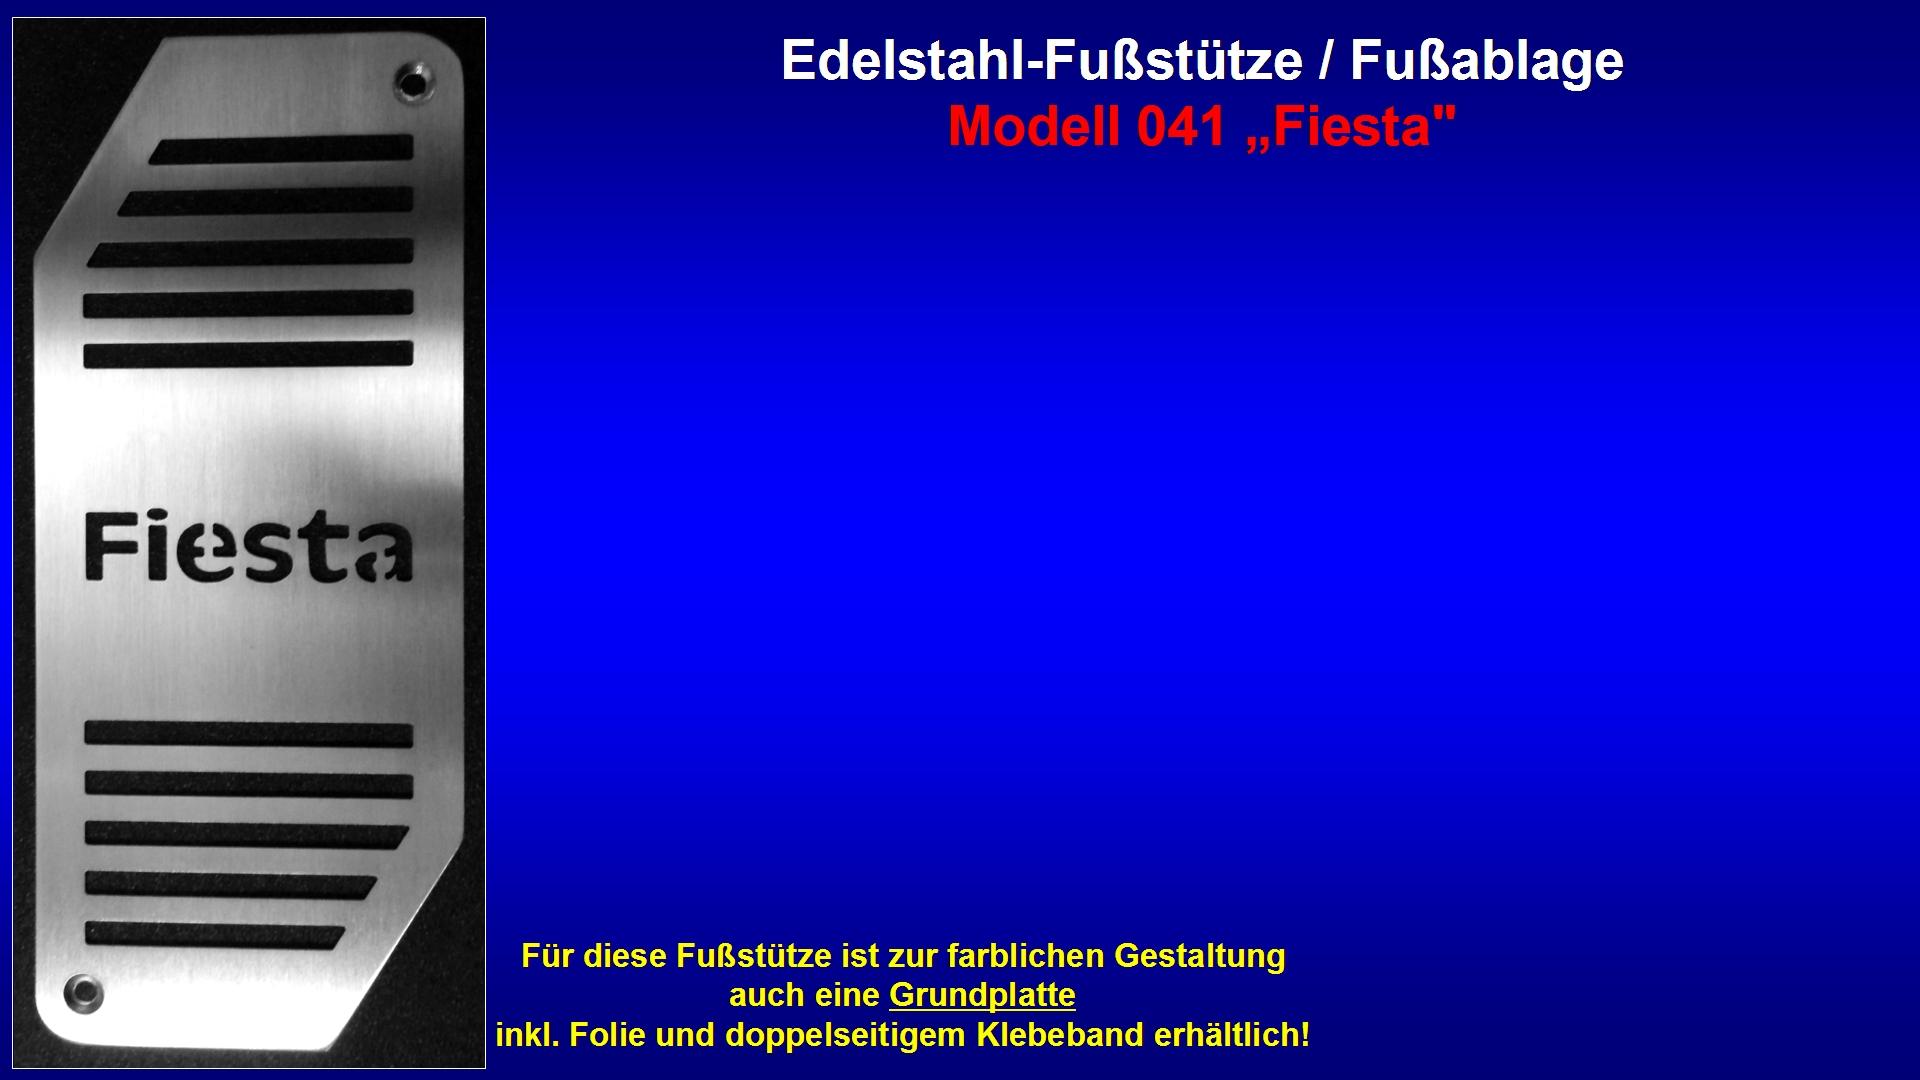 Präsentation Edelstahl-Fußstütze Modell 041 ''Fiesta'' [Fiesta-Druckschrift].jpg